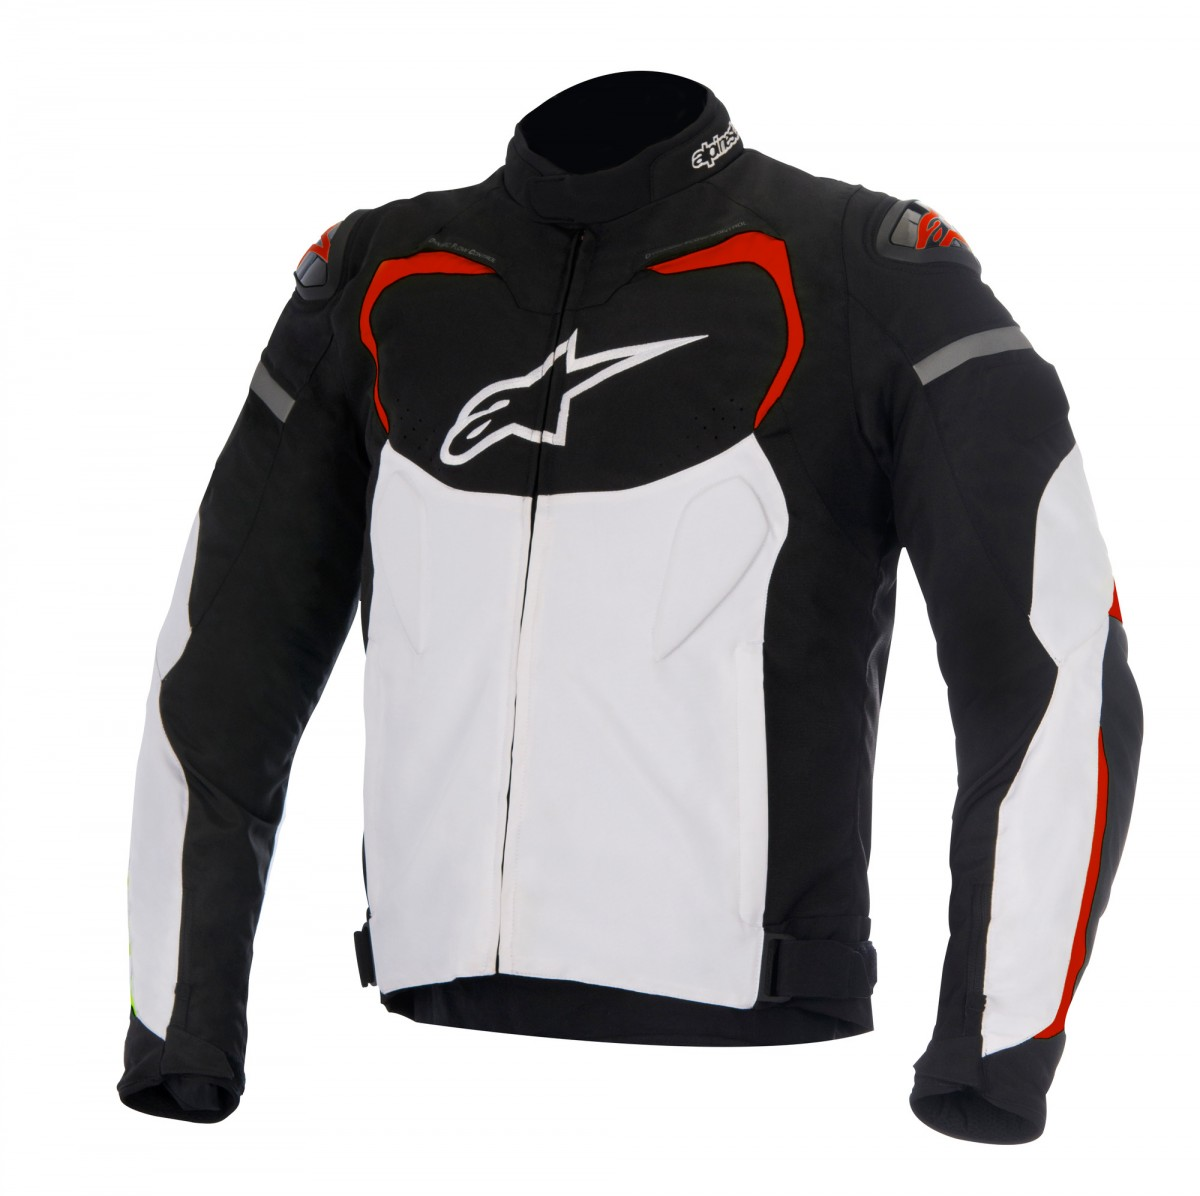 Jaqueta Alpinestars T-GP Pro (Black/White/Red)  - Nova Suzuki Motos e Acessórios